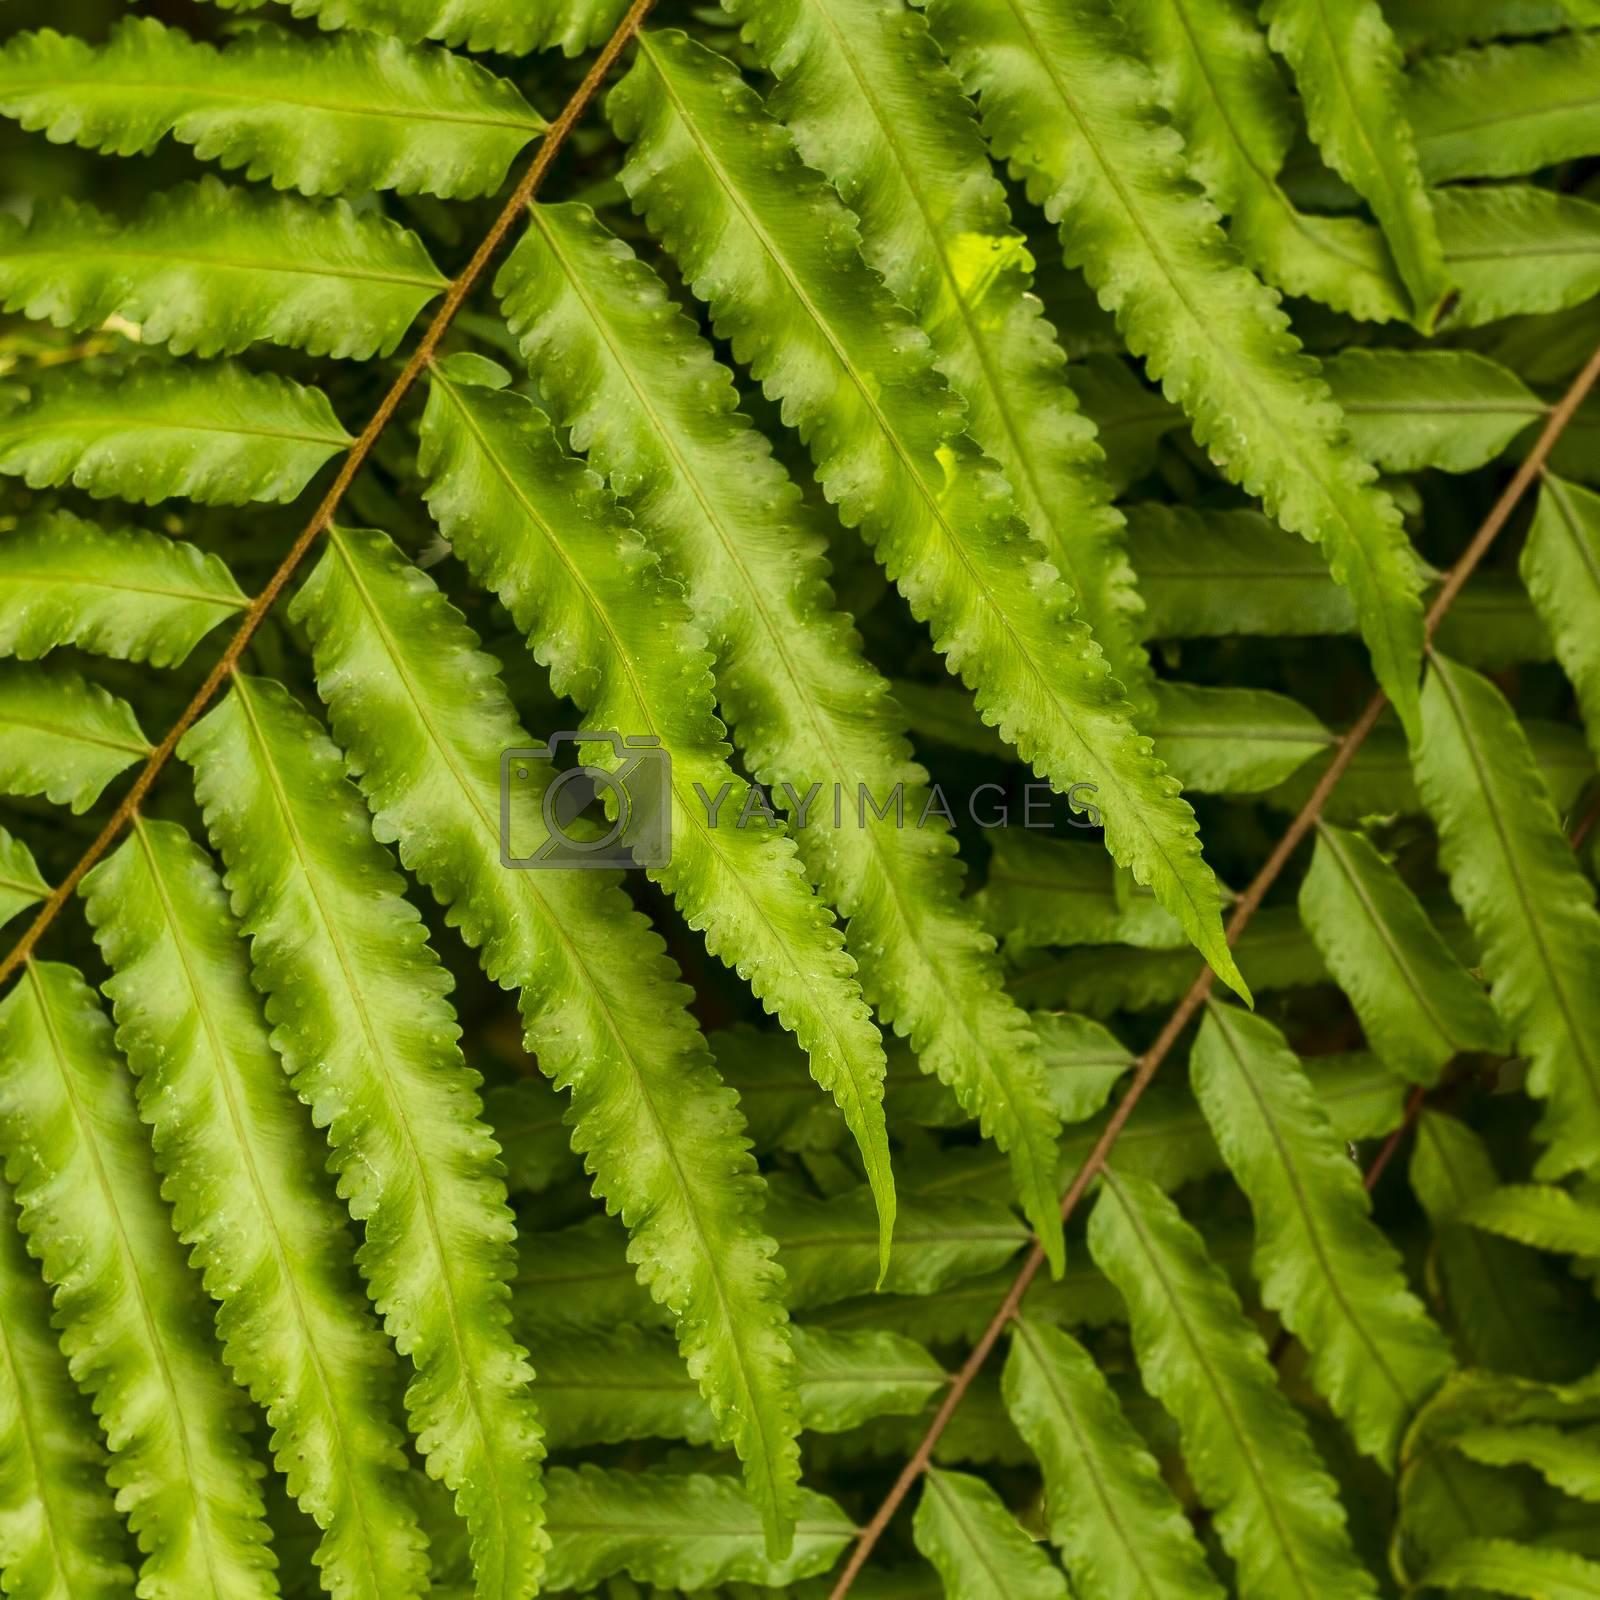 Close up fern leaf in the garden